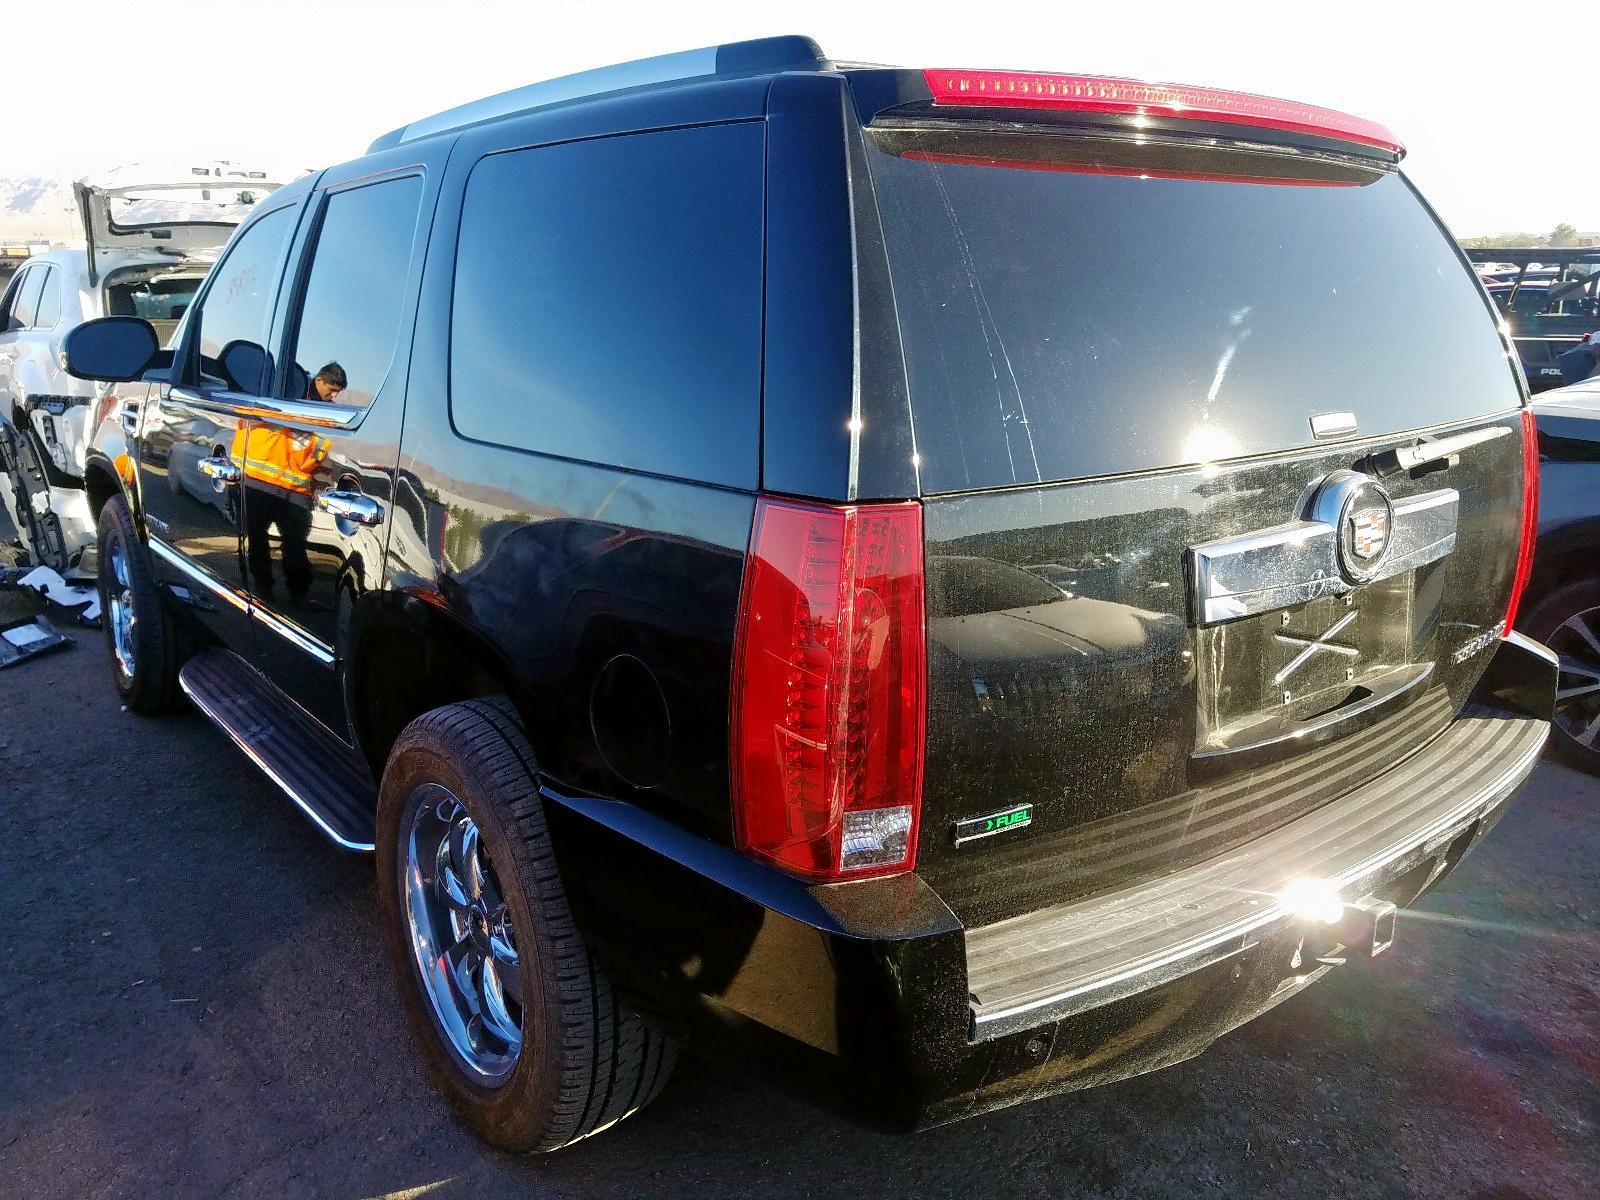 1GYS4AEF0BR132555 - 2011 Cadillac Escalade 6.2L [Angle] View